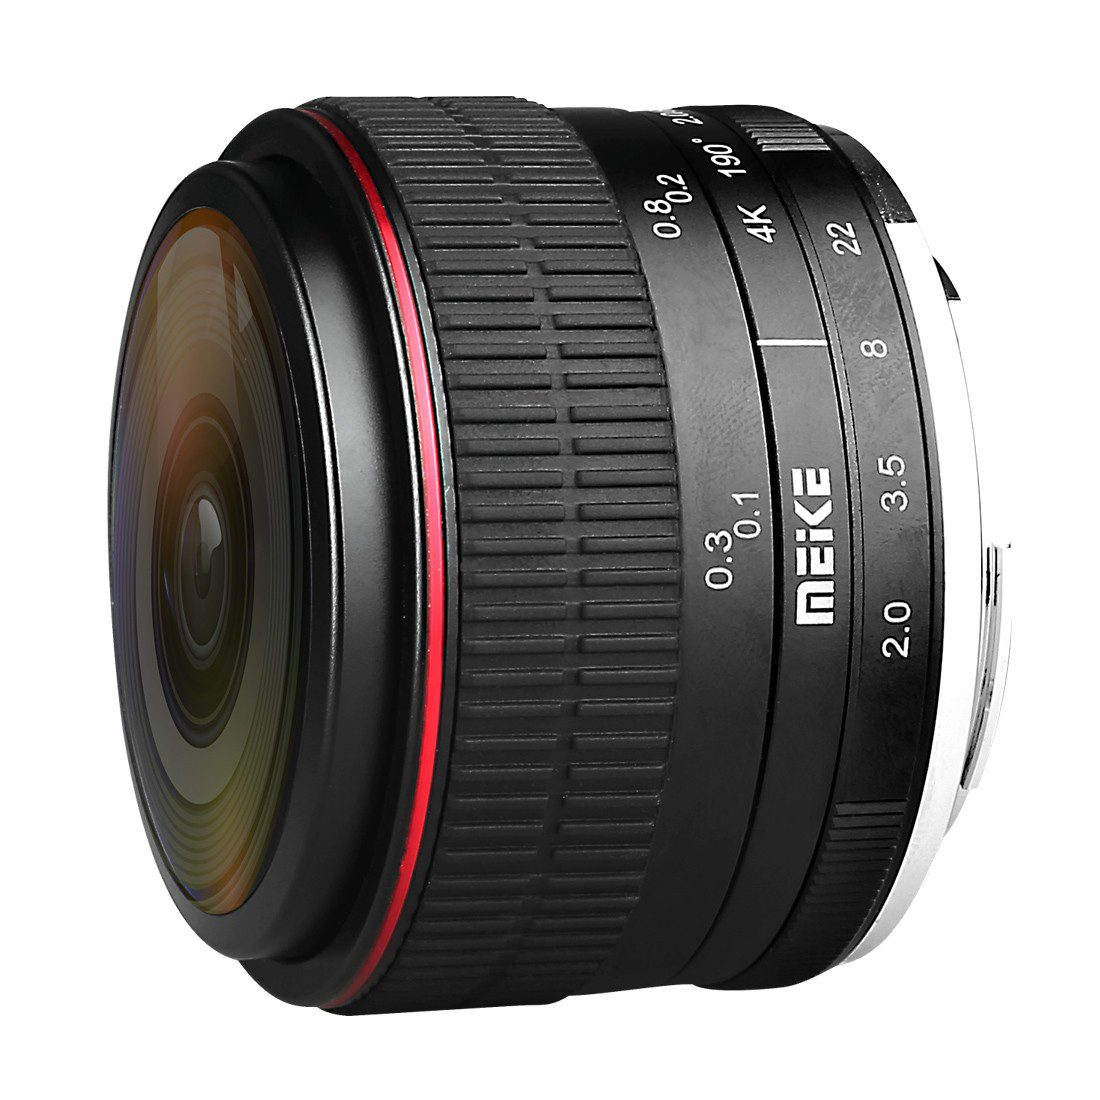 Meike MK-6.5mm f/2.0 Fisheye Canon EF-M objectief met korting